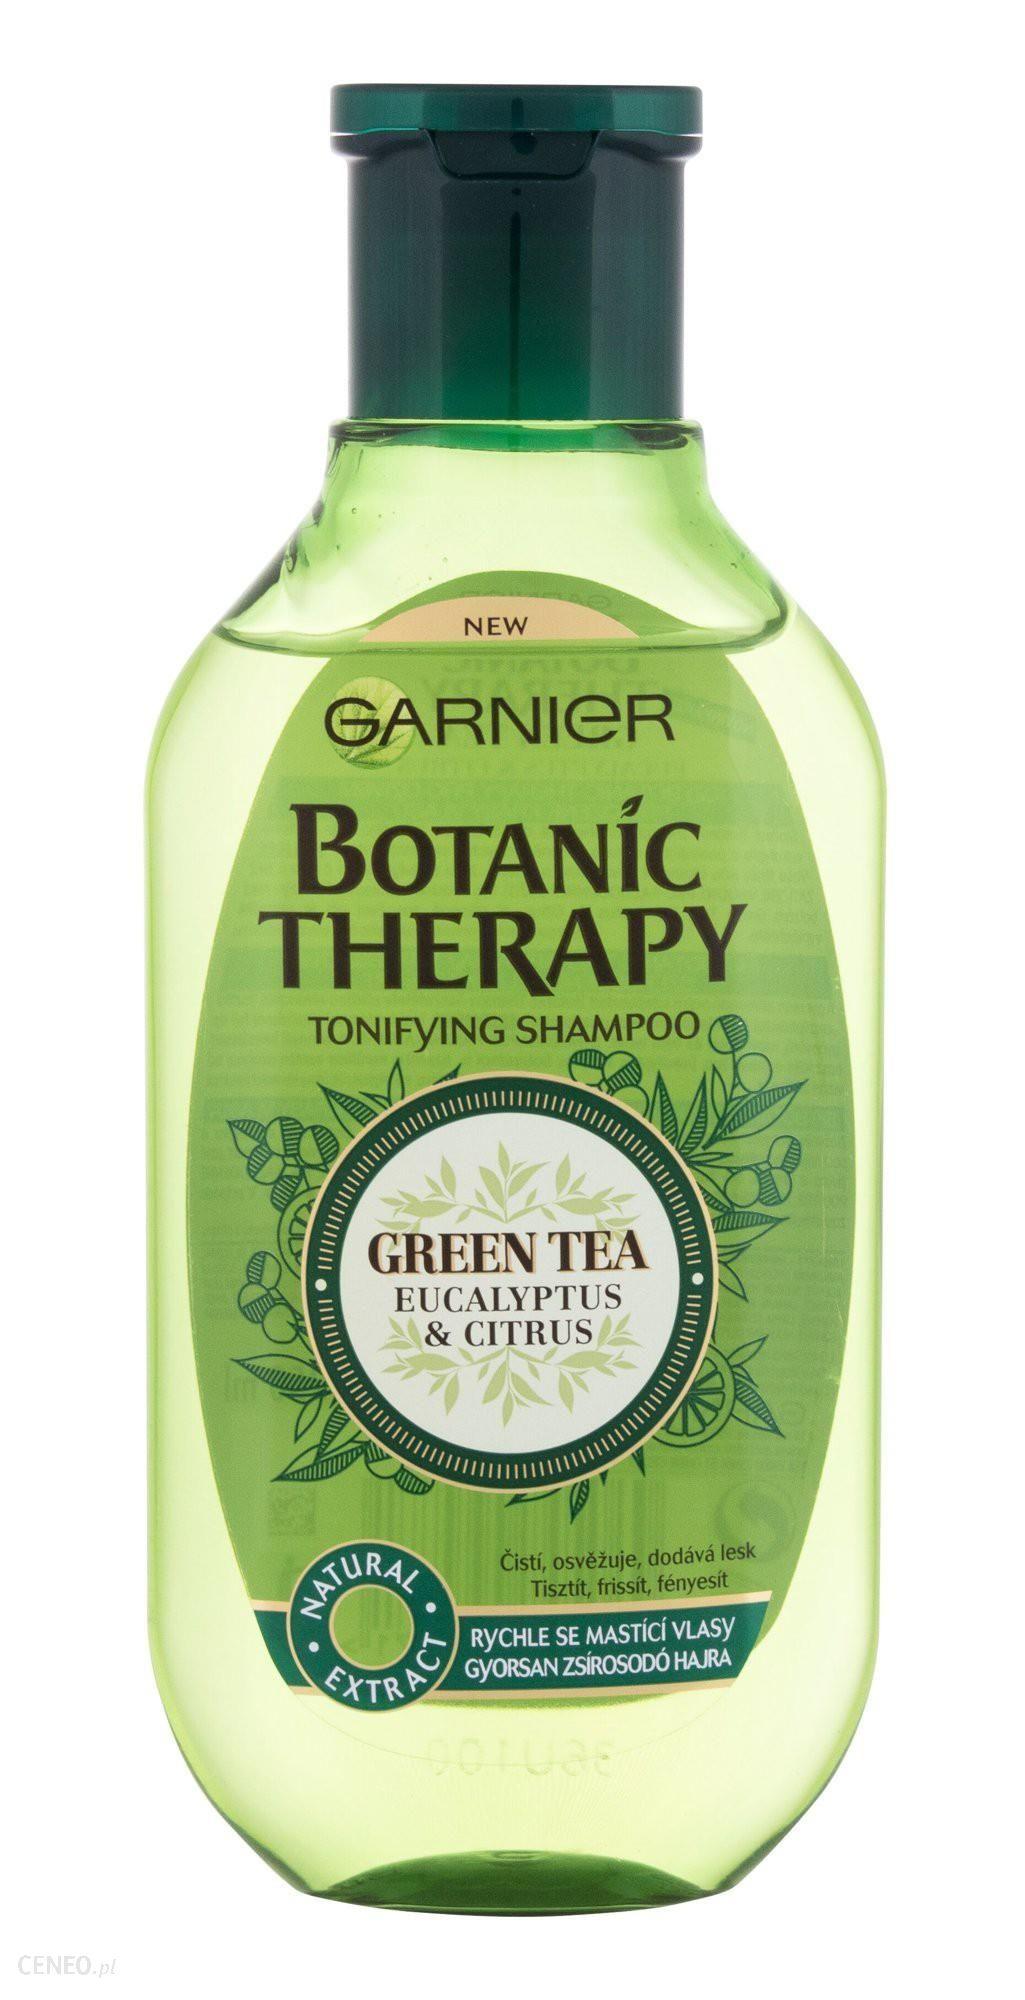 Garnier Botanic Therapy Green Tea Eucalyptus & Citrus Szampon do włosów 250ml